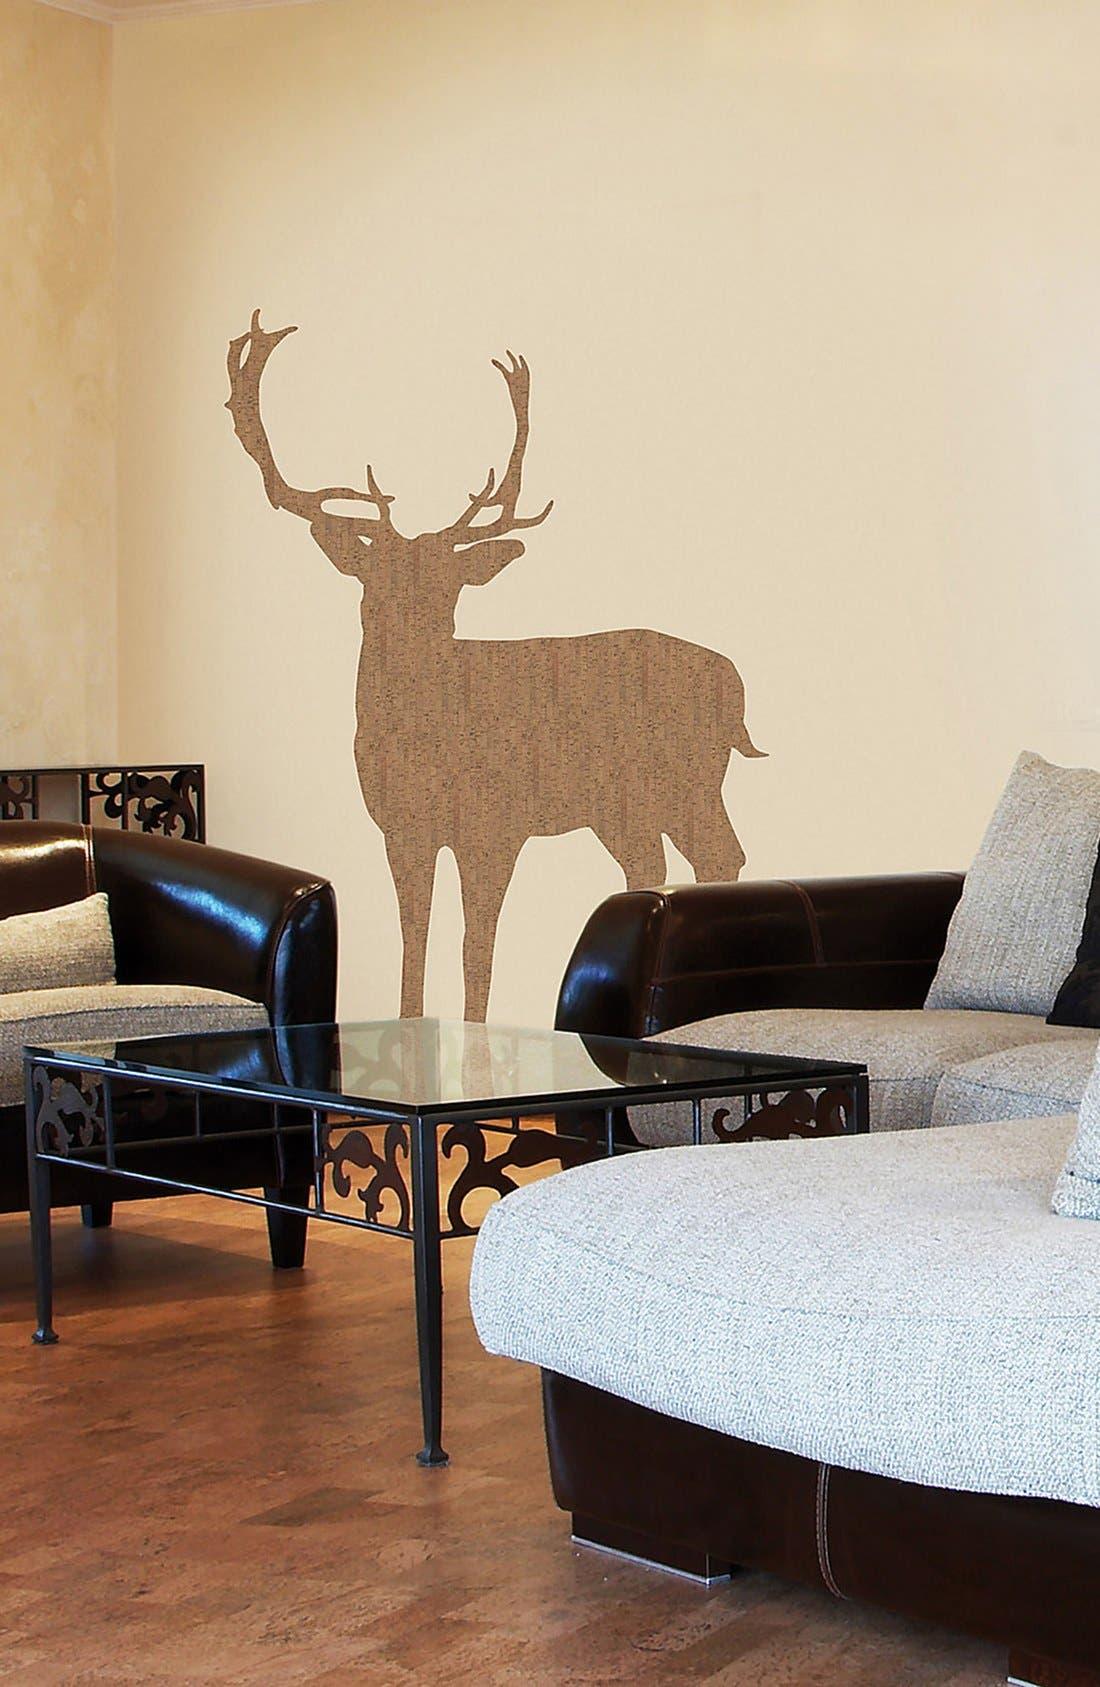 Main Image - Wallpops 'Deer' Cork Wall Art